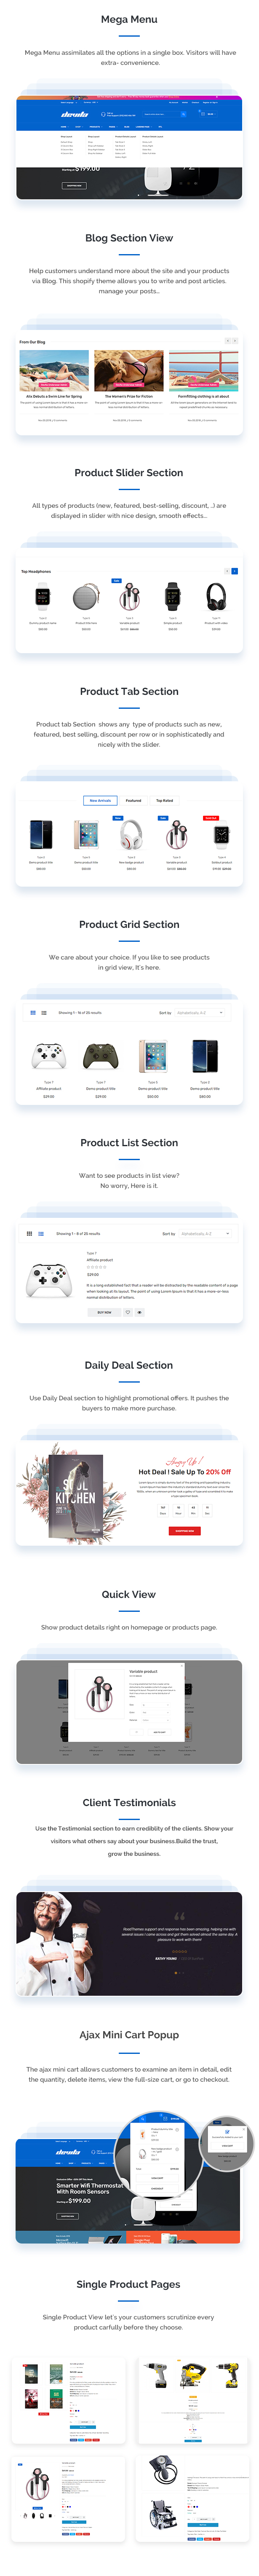 Devita - eCommerce Shopify Theme - 10